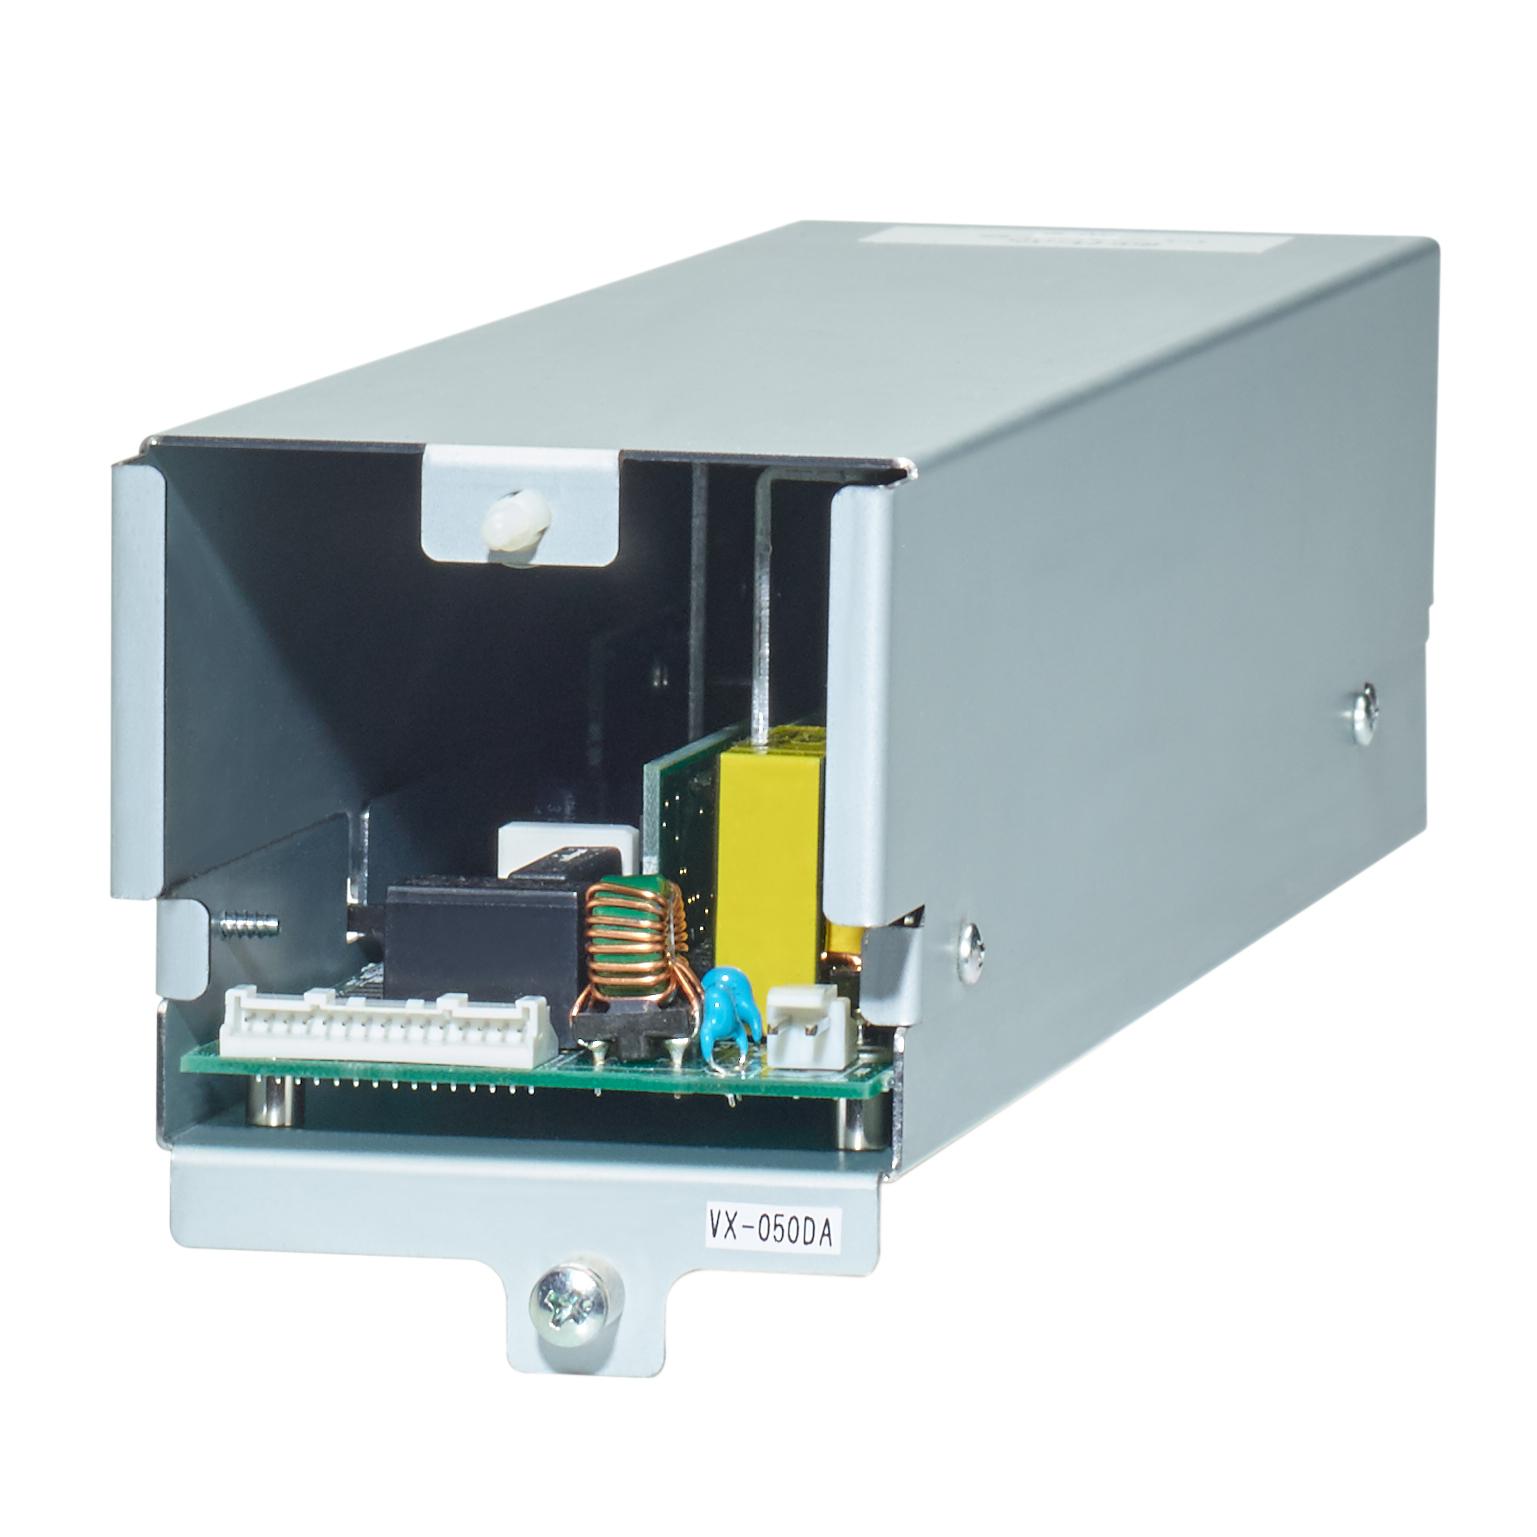 Vx 050da Toa Corporation 500watt Power Amplifier Circuit Schematic Diagram